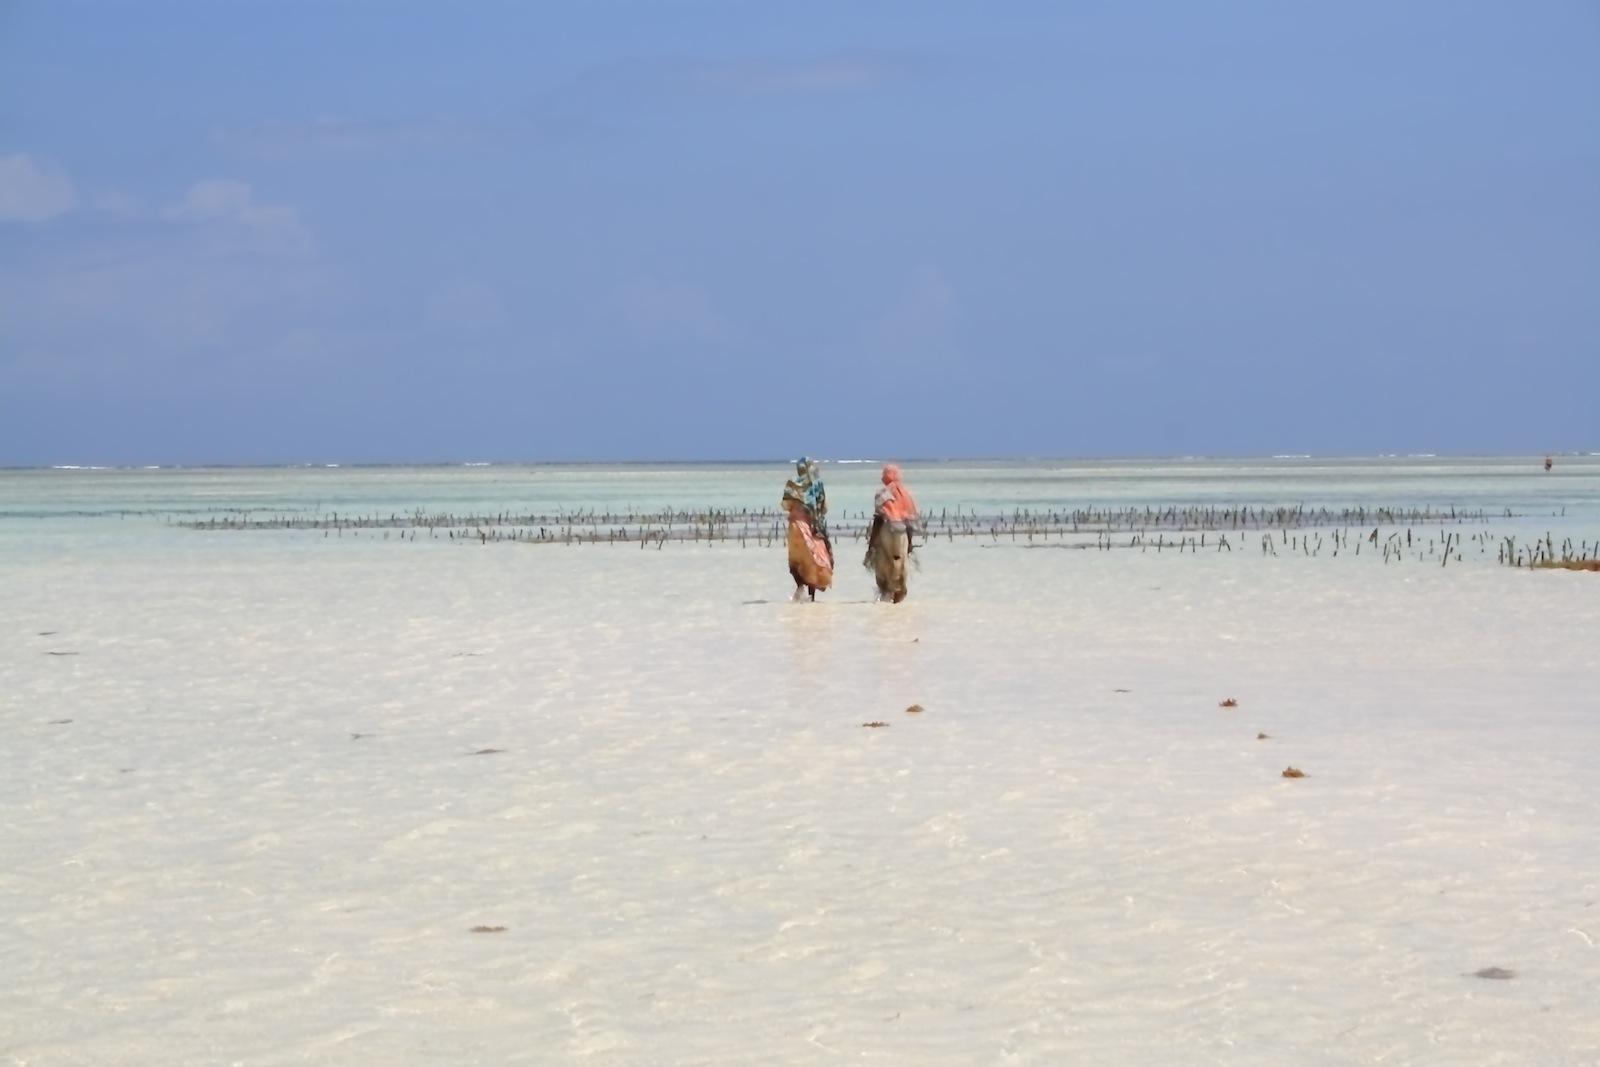 Granjeras de algas en el Índico (Zanzíbar [Tanzania]) Zanzibar6